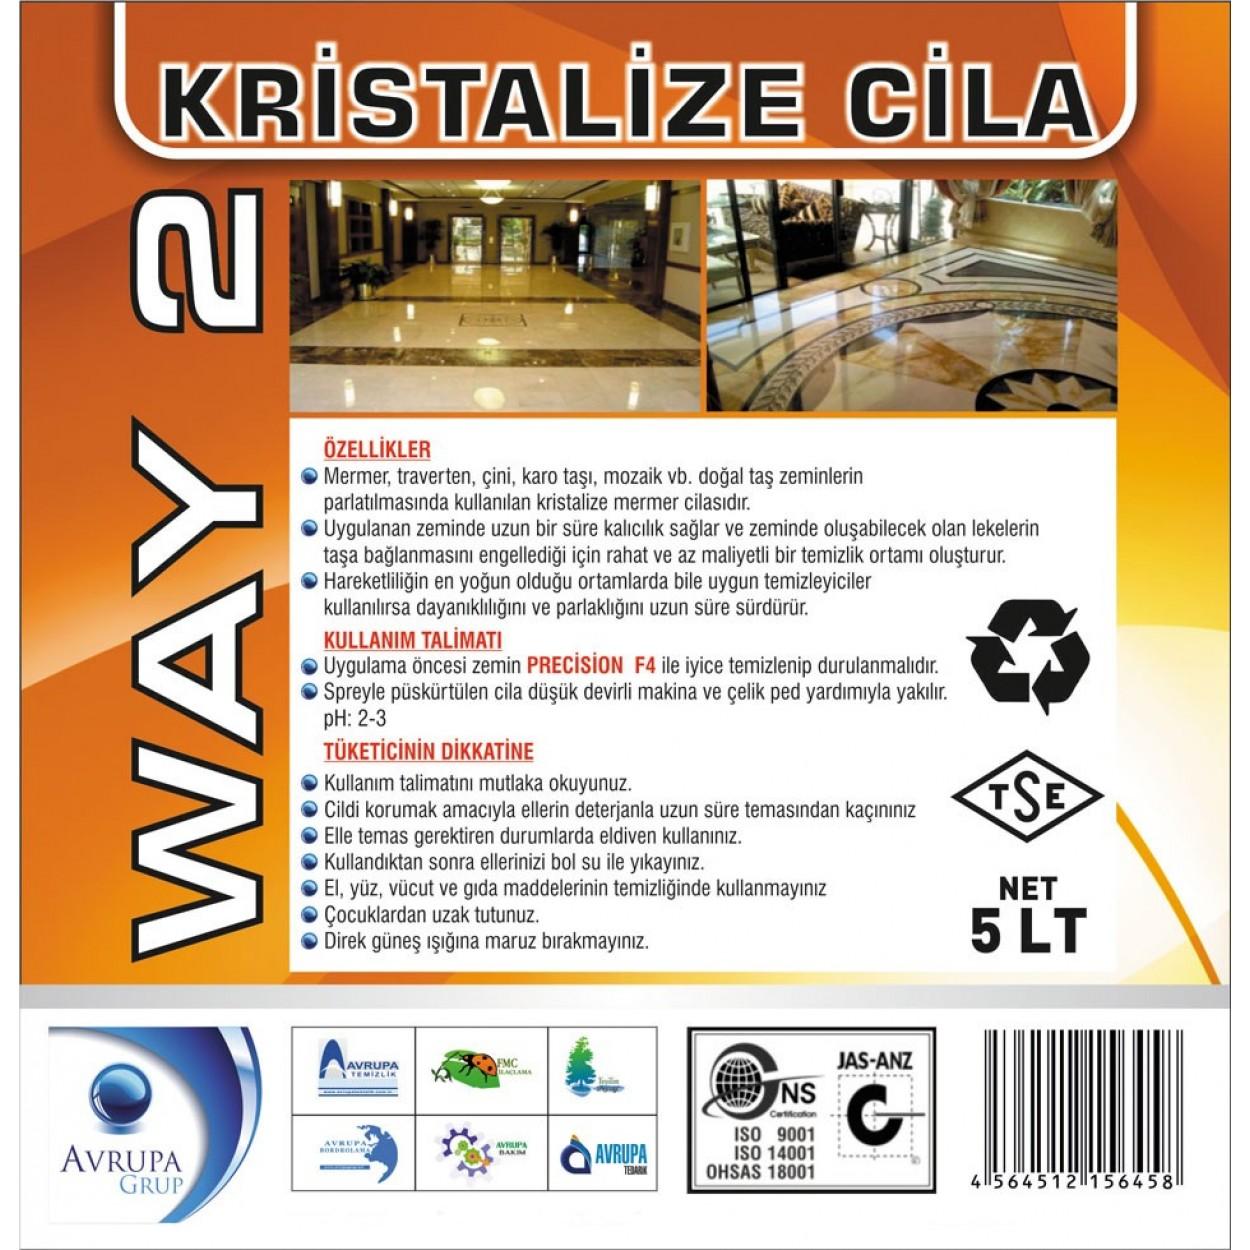 WAY 2 Sıvı Kristalizasyon Cilası 5 Litre